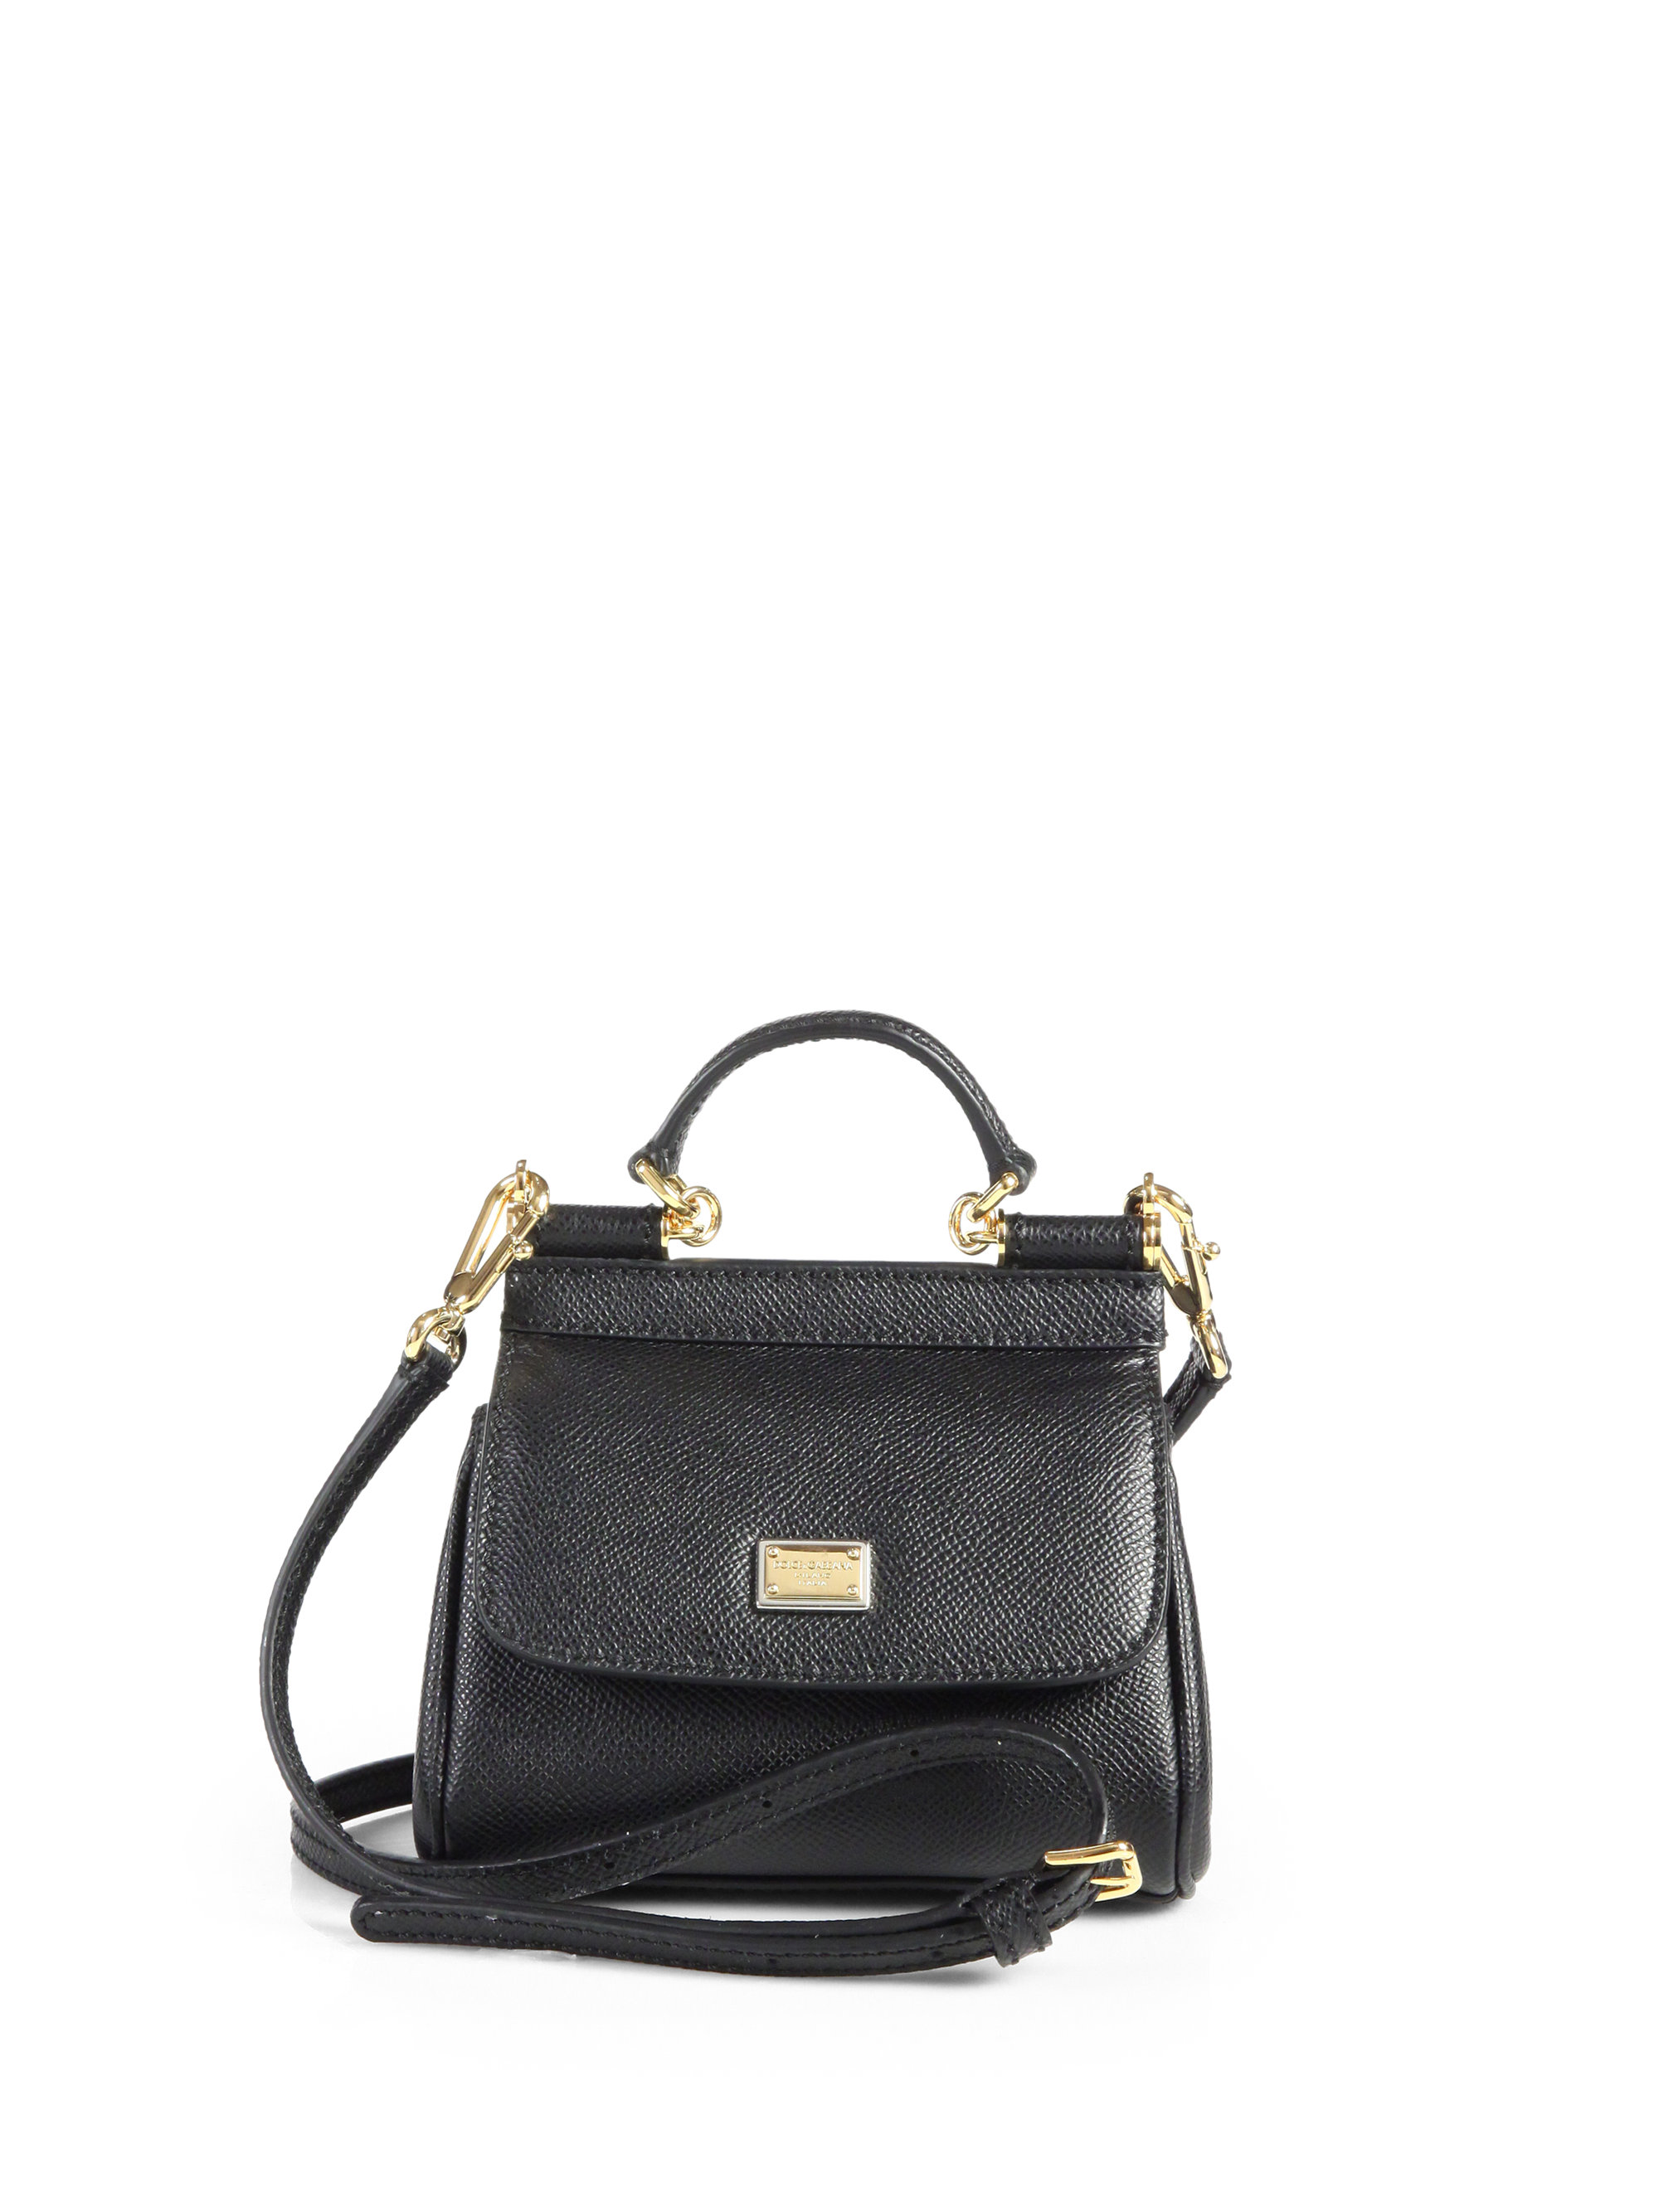 Lyst - Dolce   Gabbana Mini Miss Sicily Cross Body Bag in Black 0bee479a4f